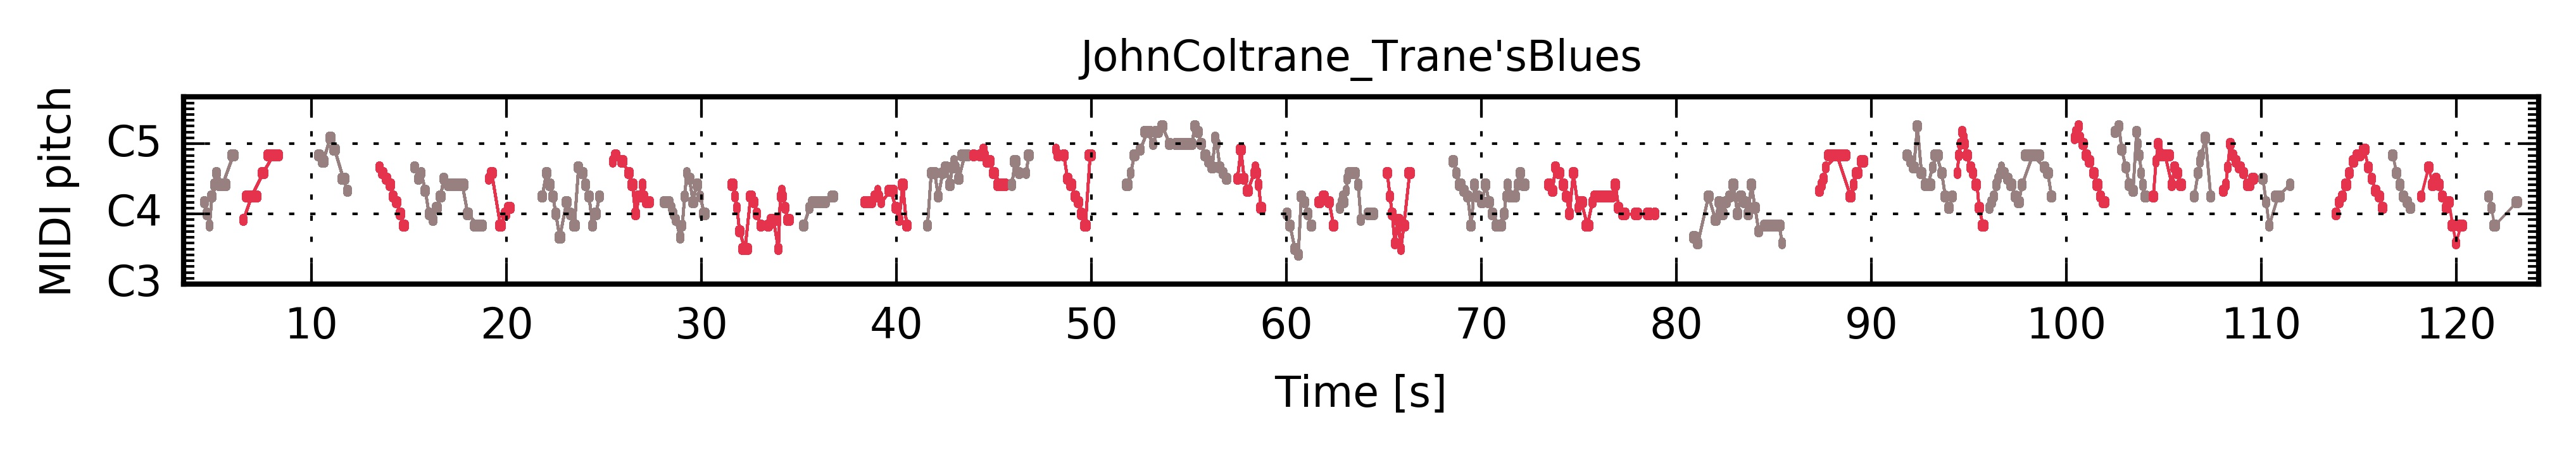 "John Coltrane ""Trane's Blues"" — The Jazzomat Research Project"